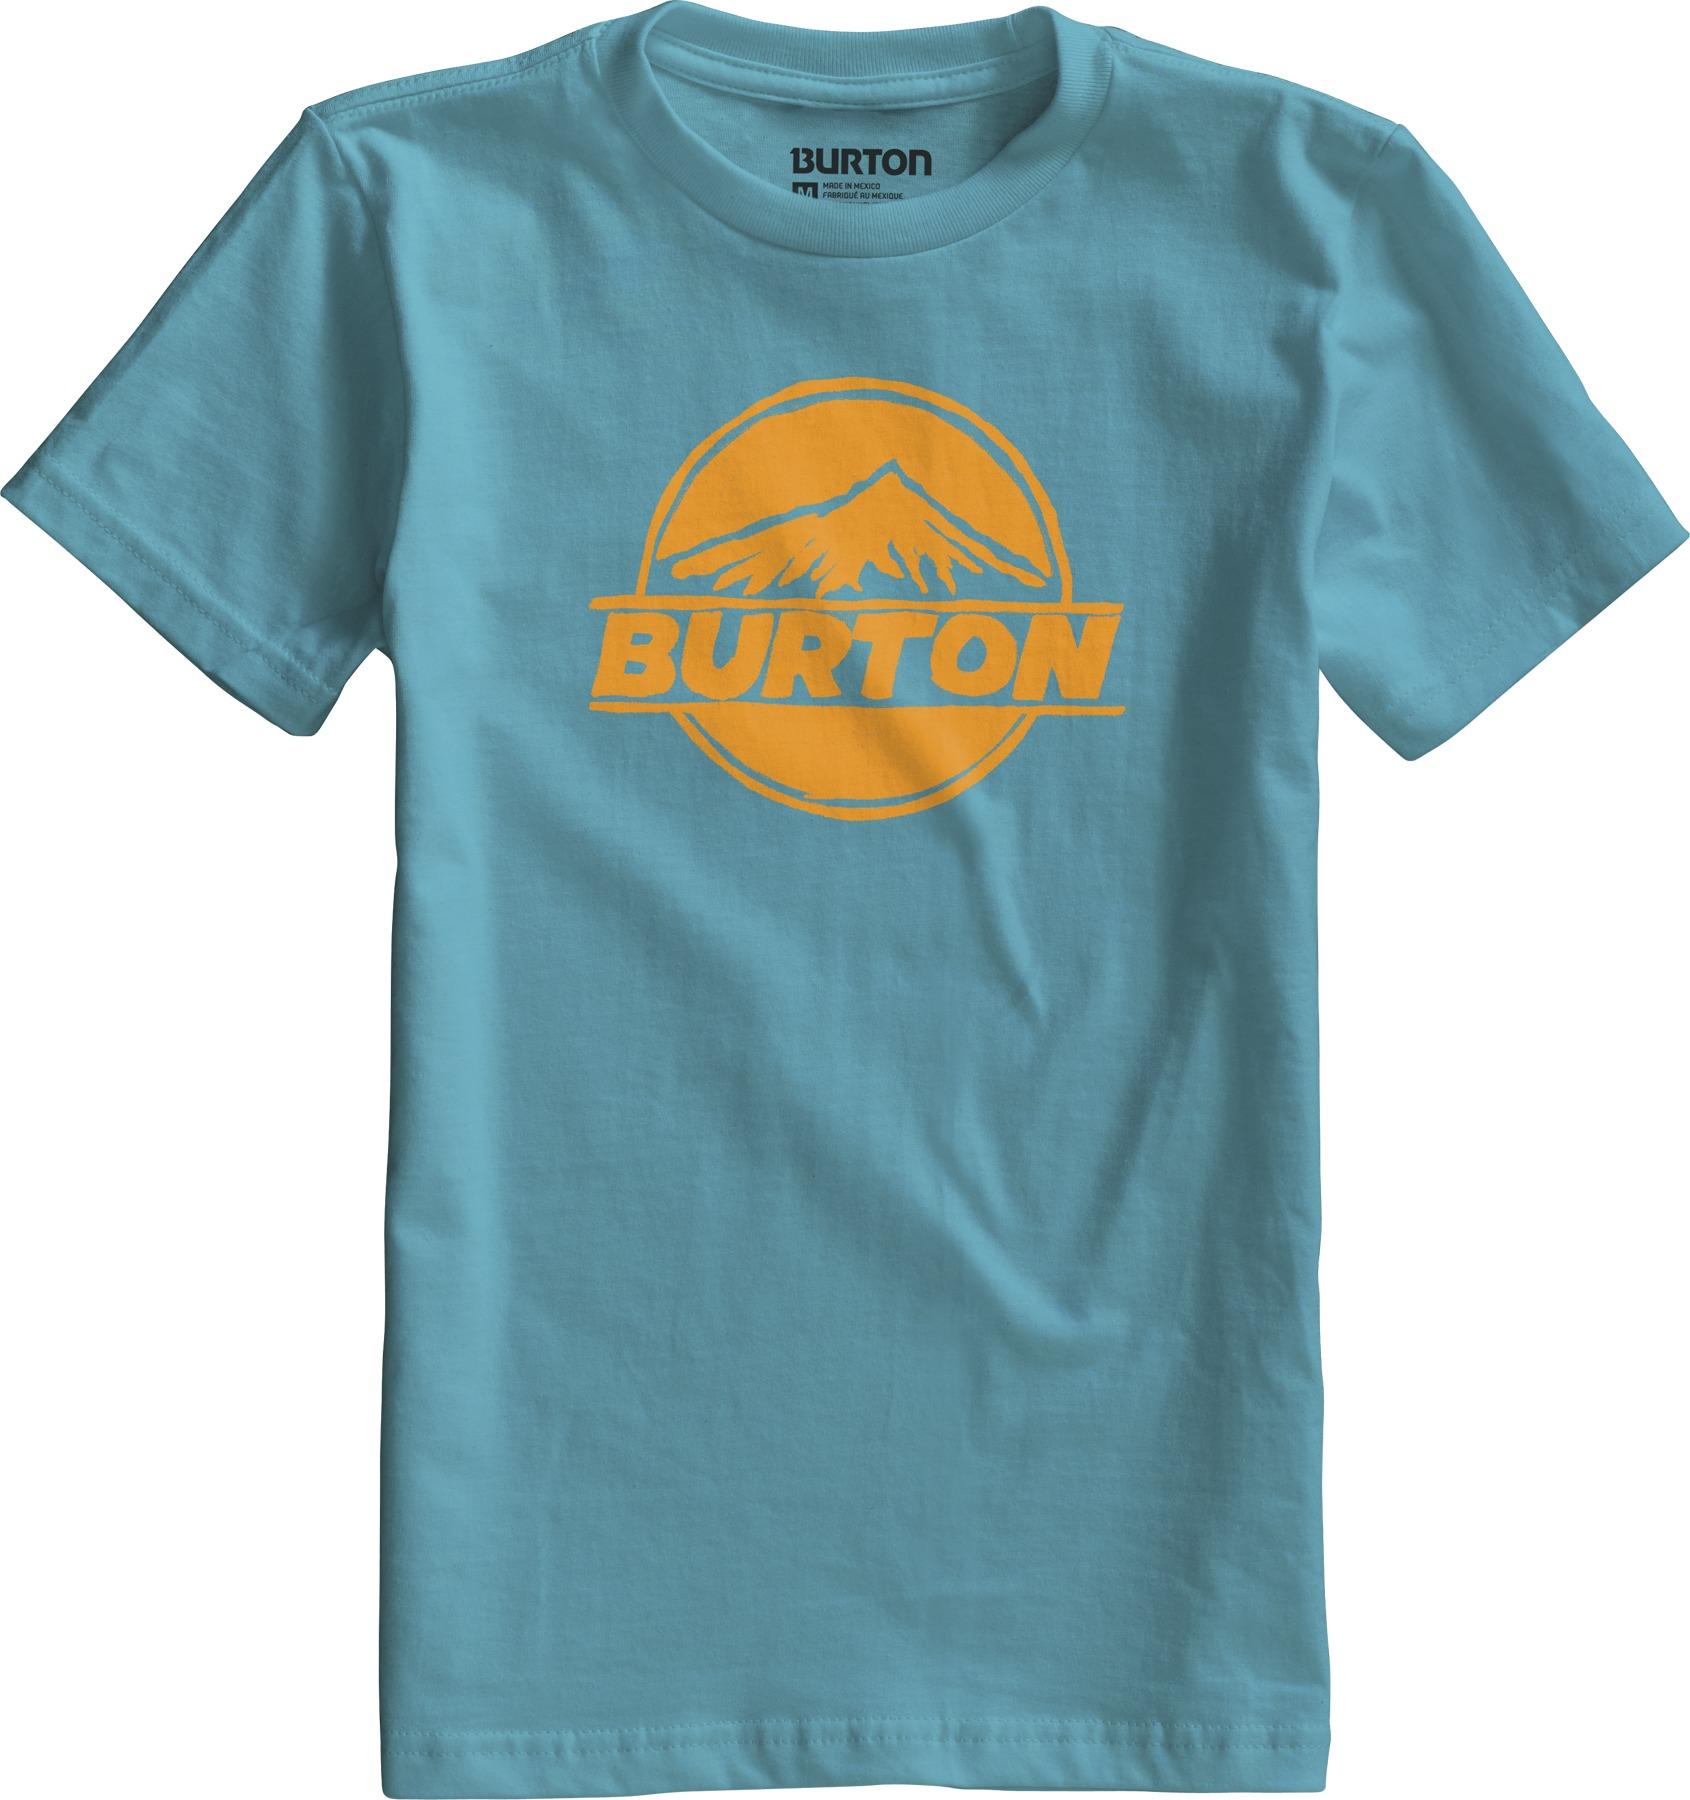 Koszulka Dziecięca Burton Boys Peaked (Gulf Stream)